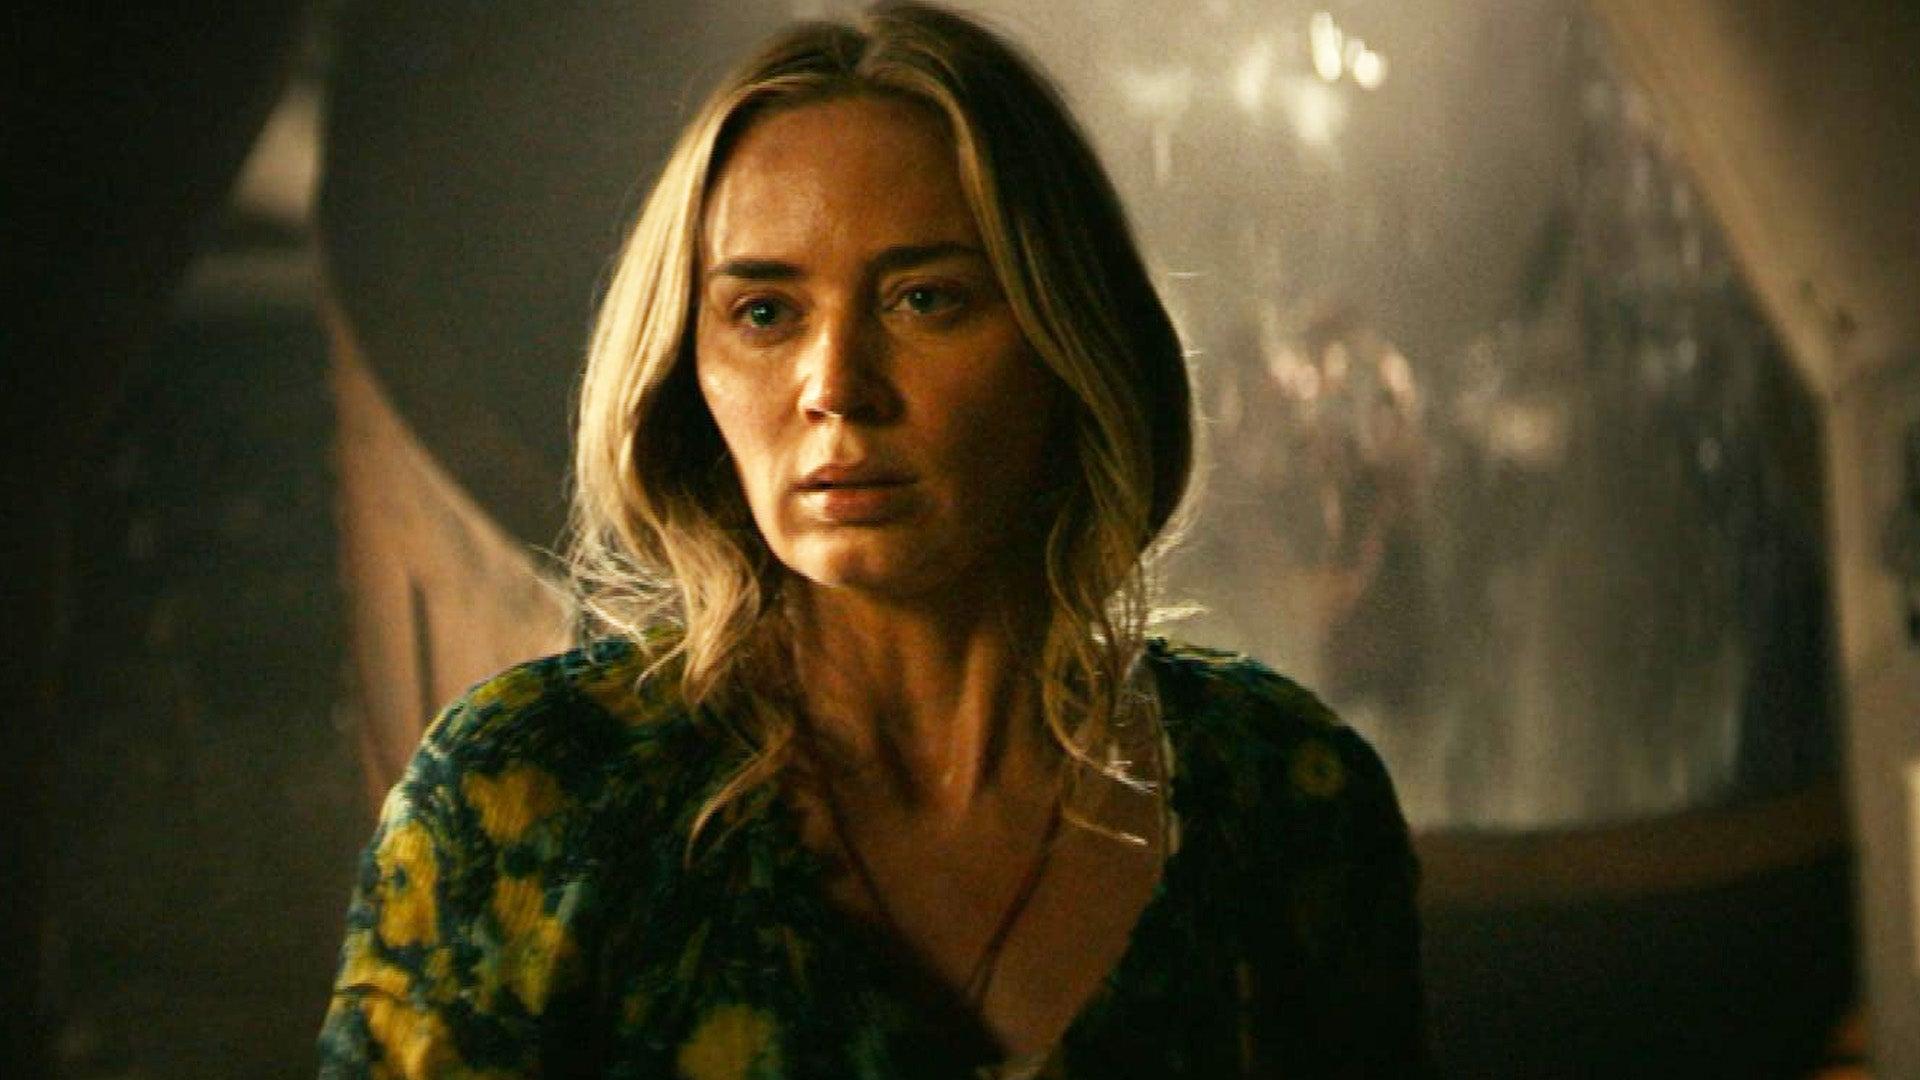 'A Quiet Place Part II' Final Trailer